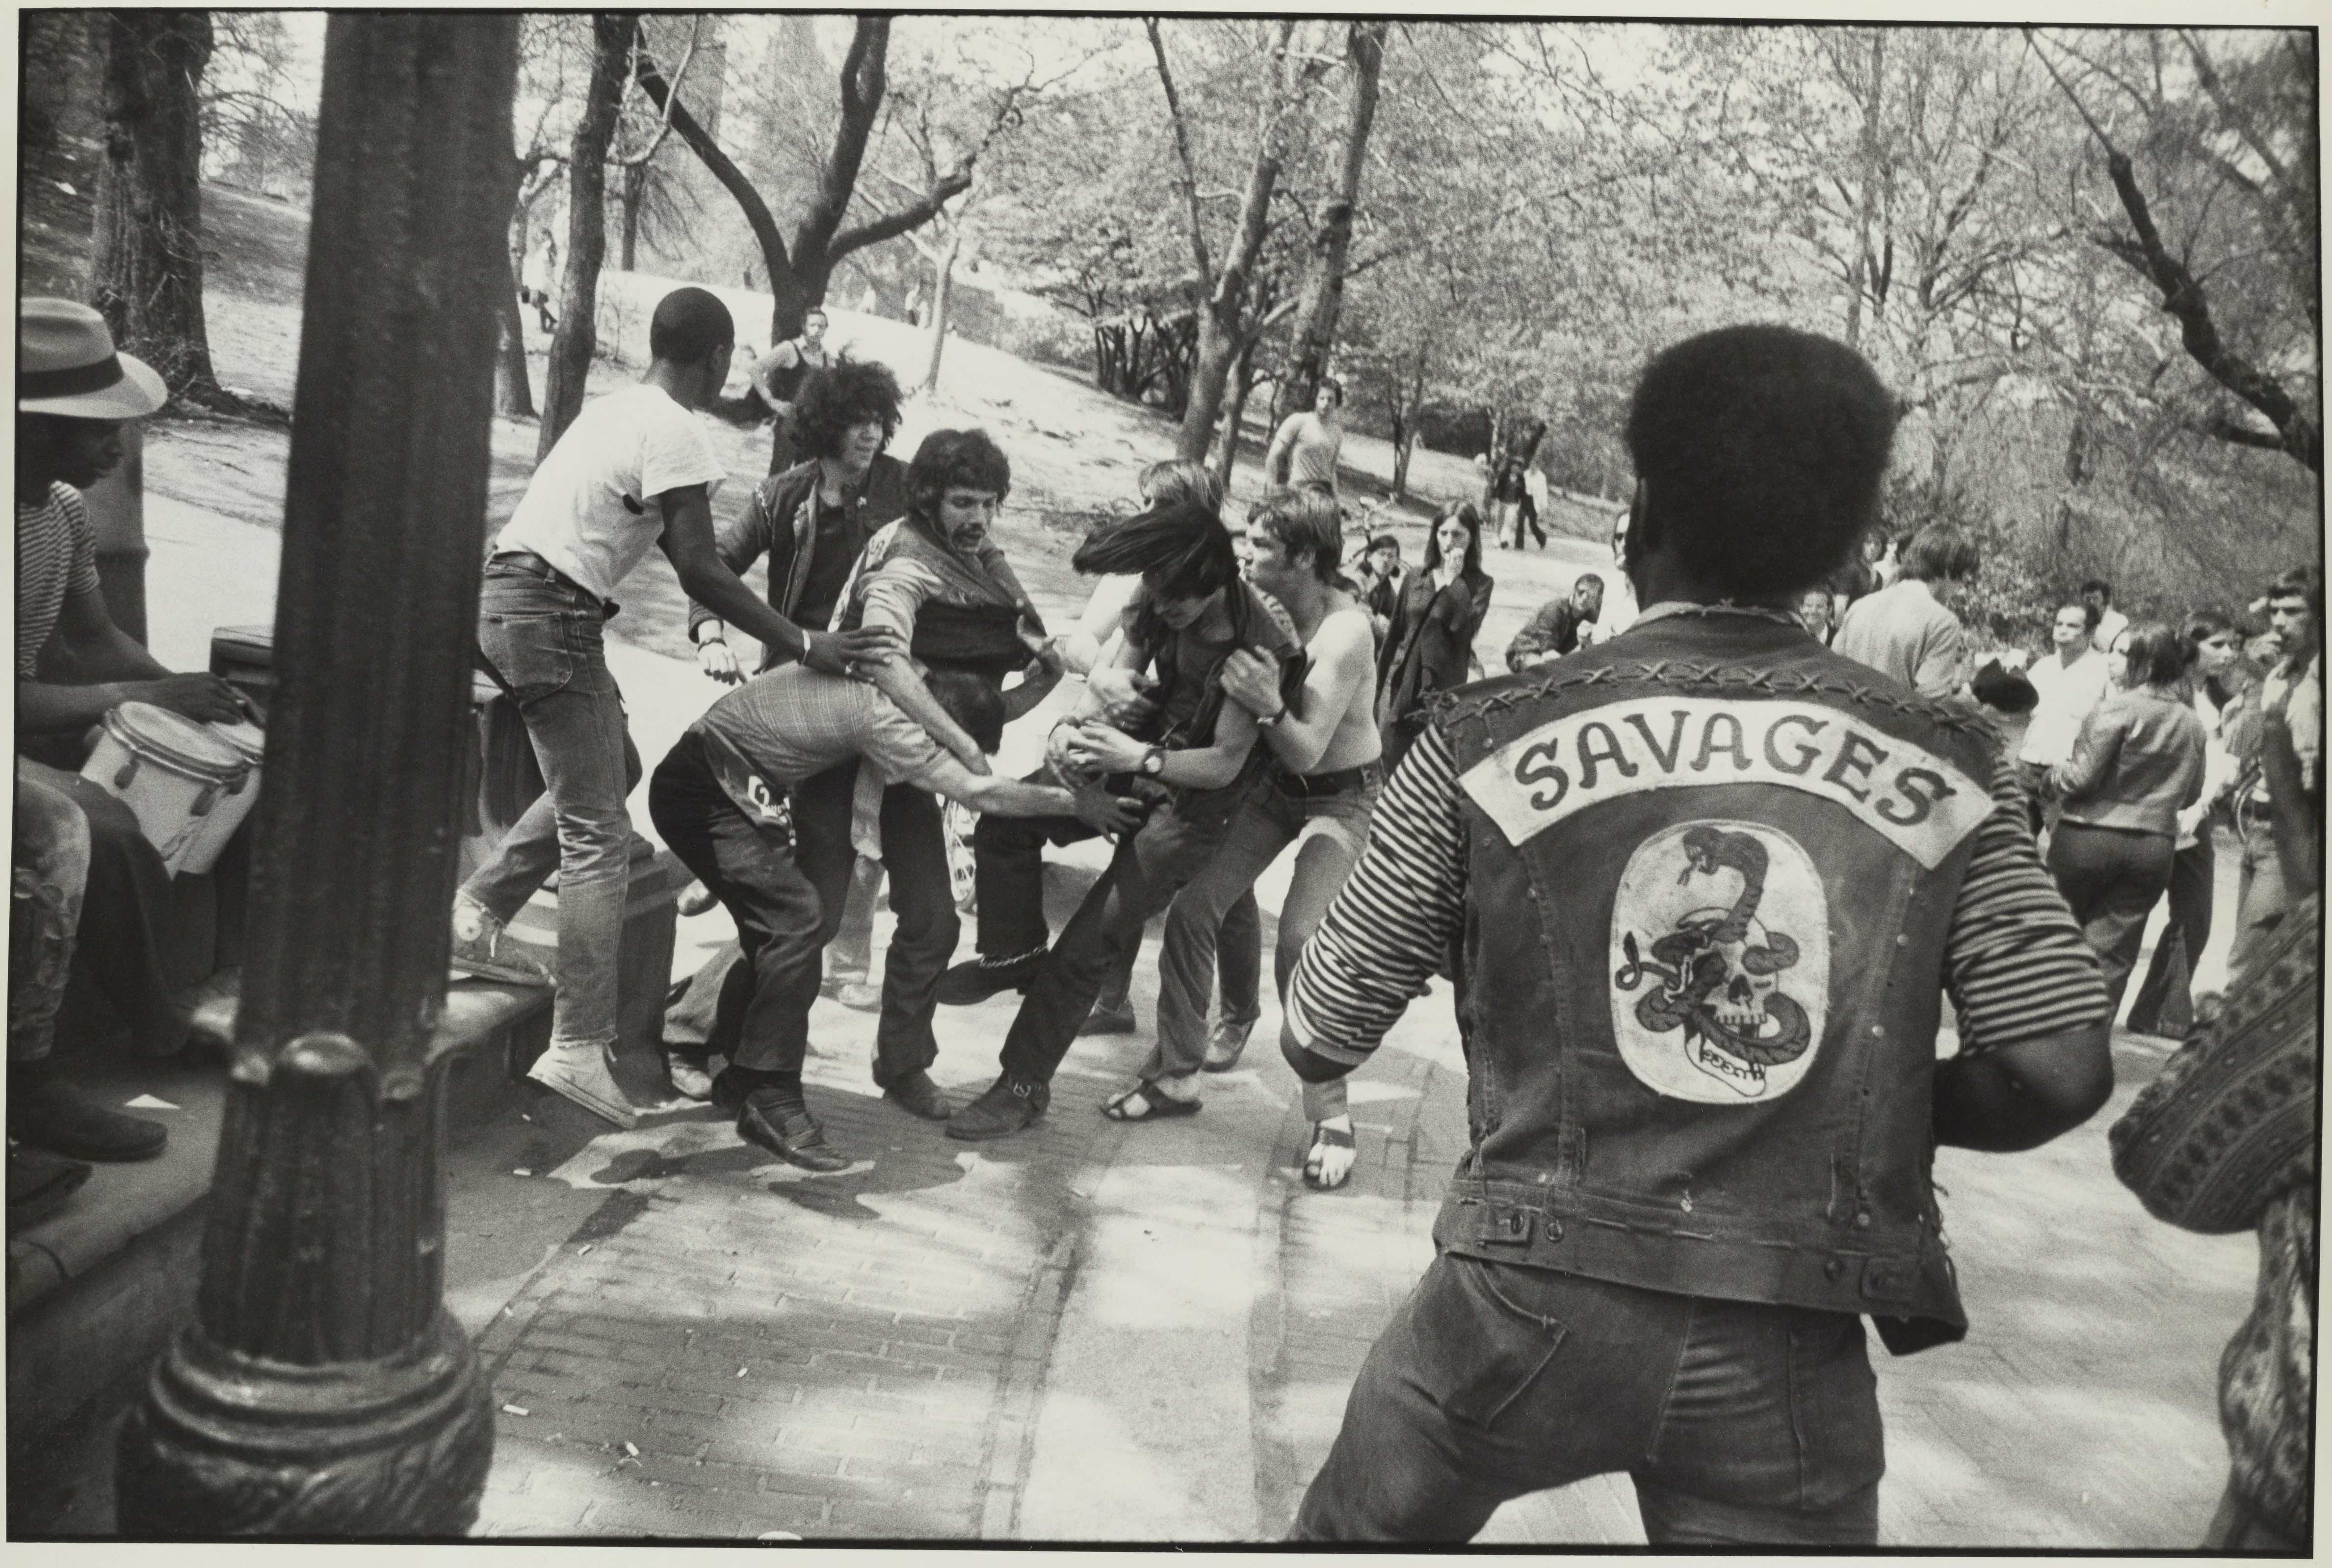 Central Park, New York, 1970